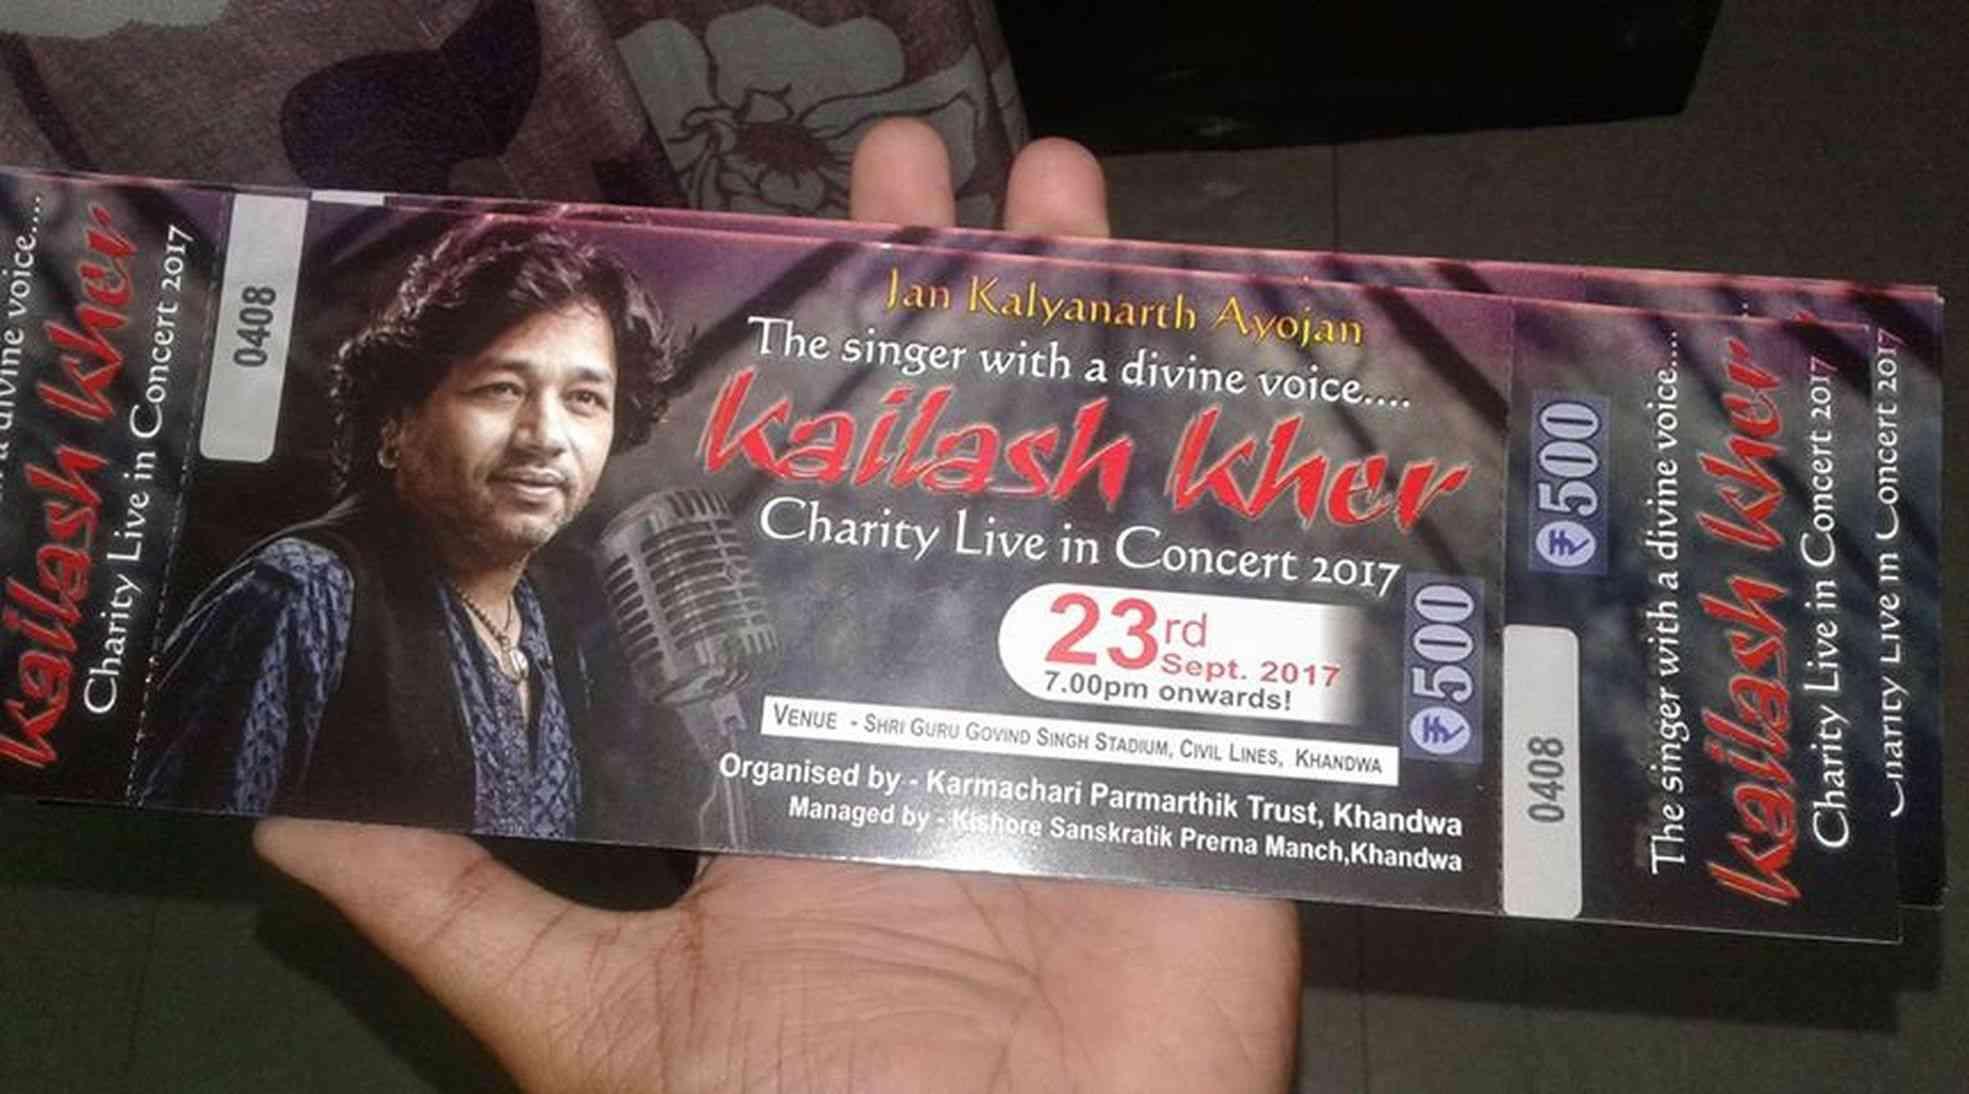 kailash kher live concert Ticket